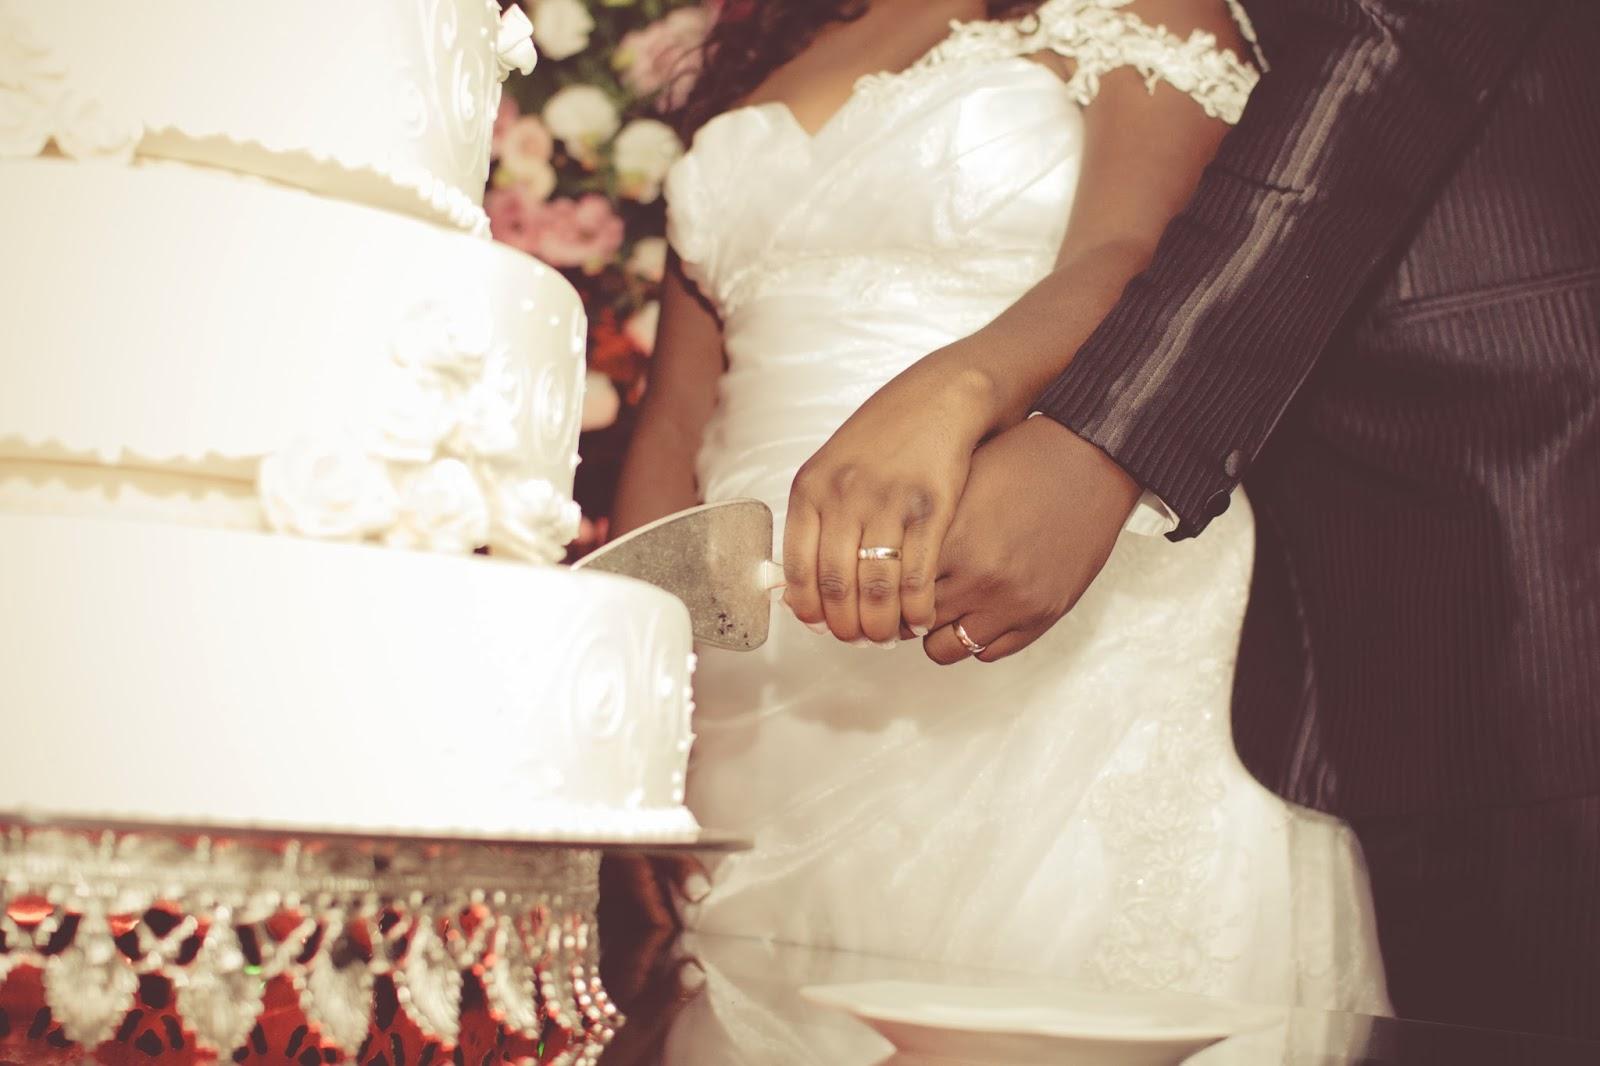 historia-amor-fe-festa-corte-do-bolo